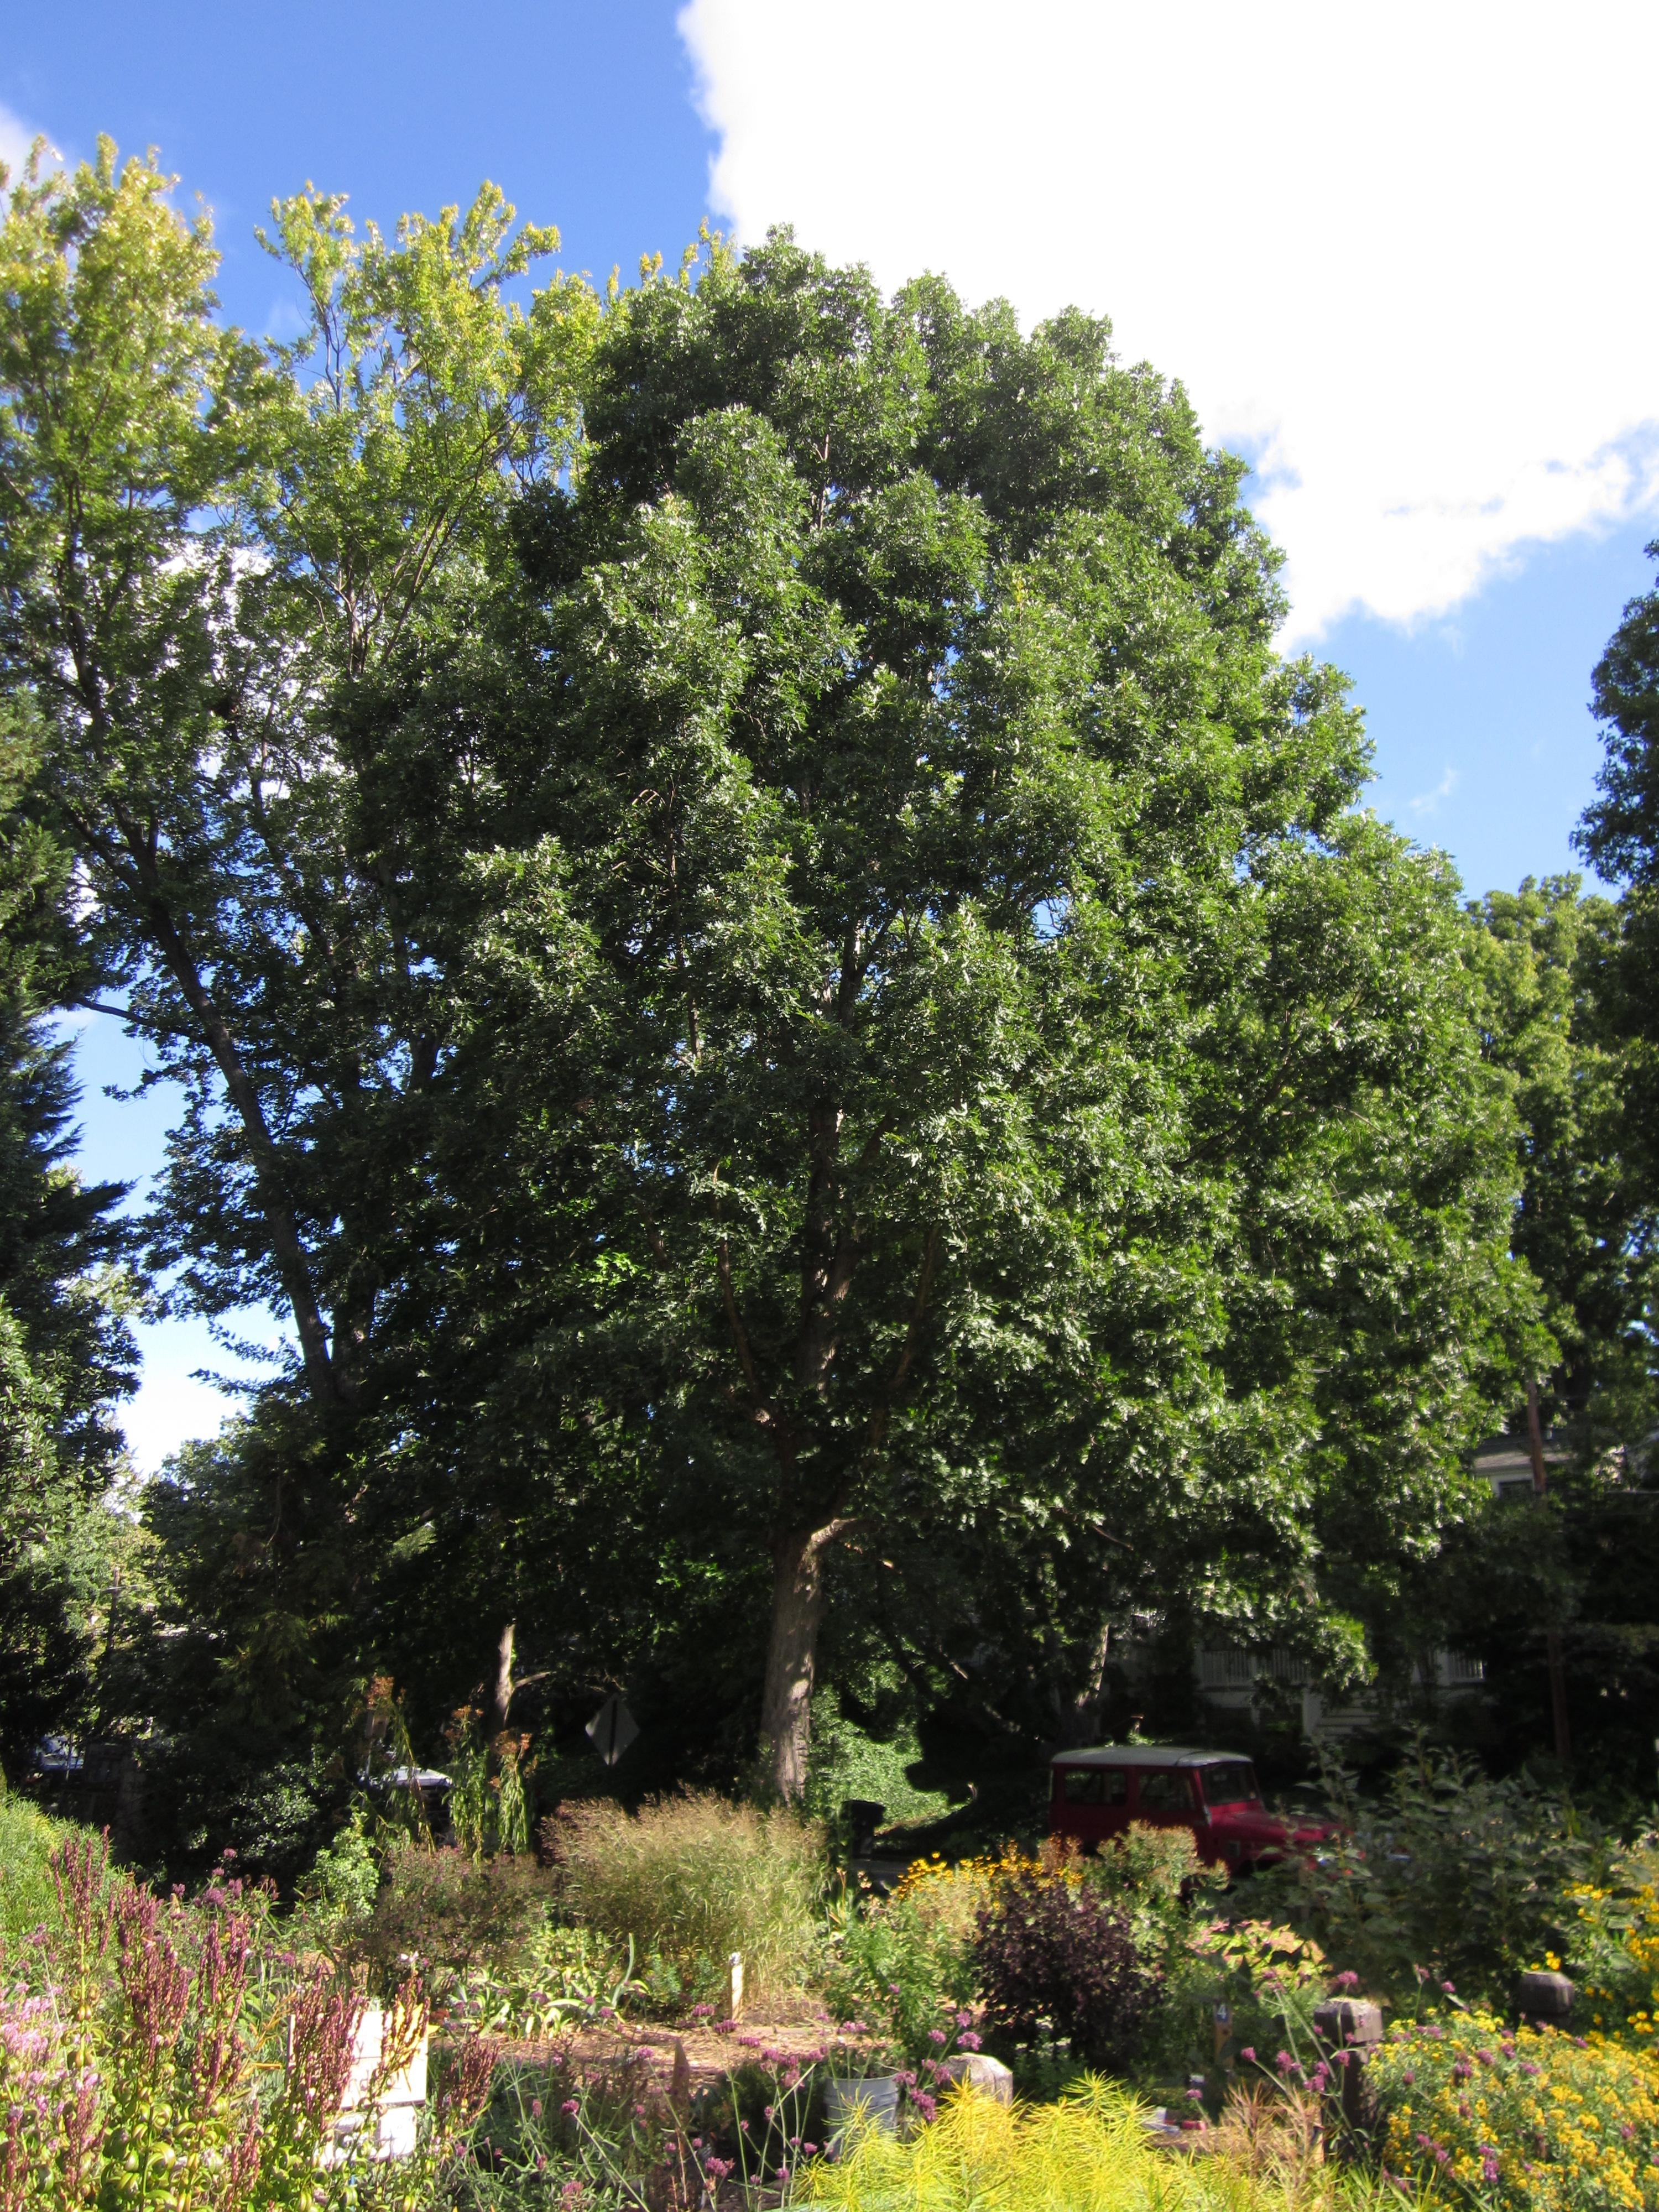 Quarry Shade Garden At Bon Air Park: TREE: Quercus Alba (White Oak)